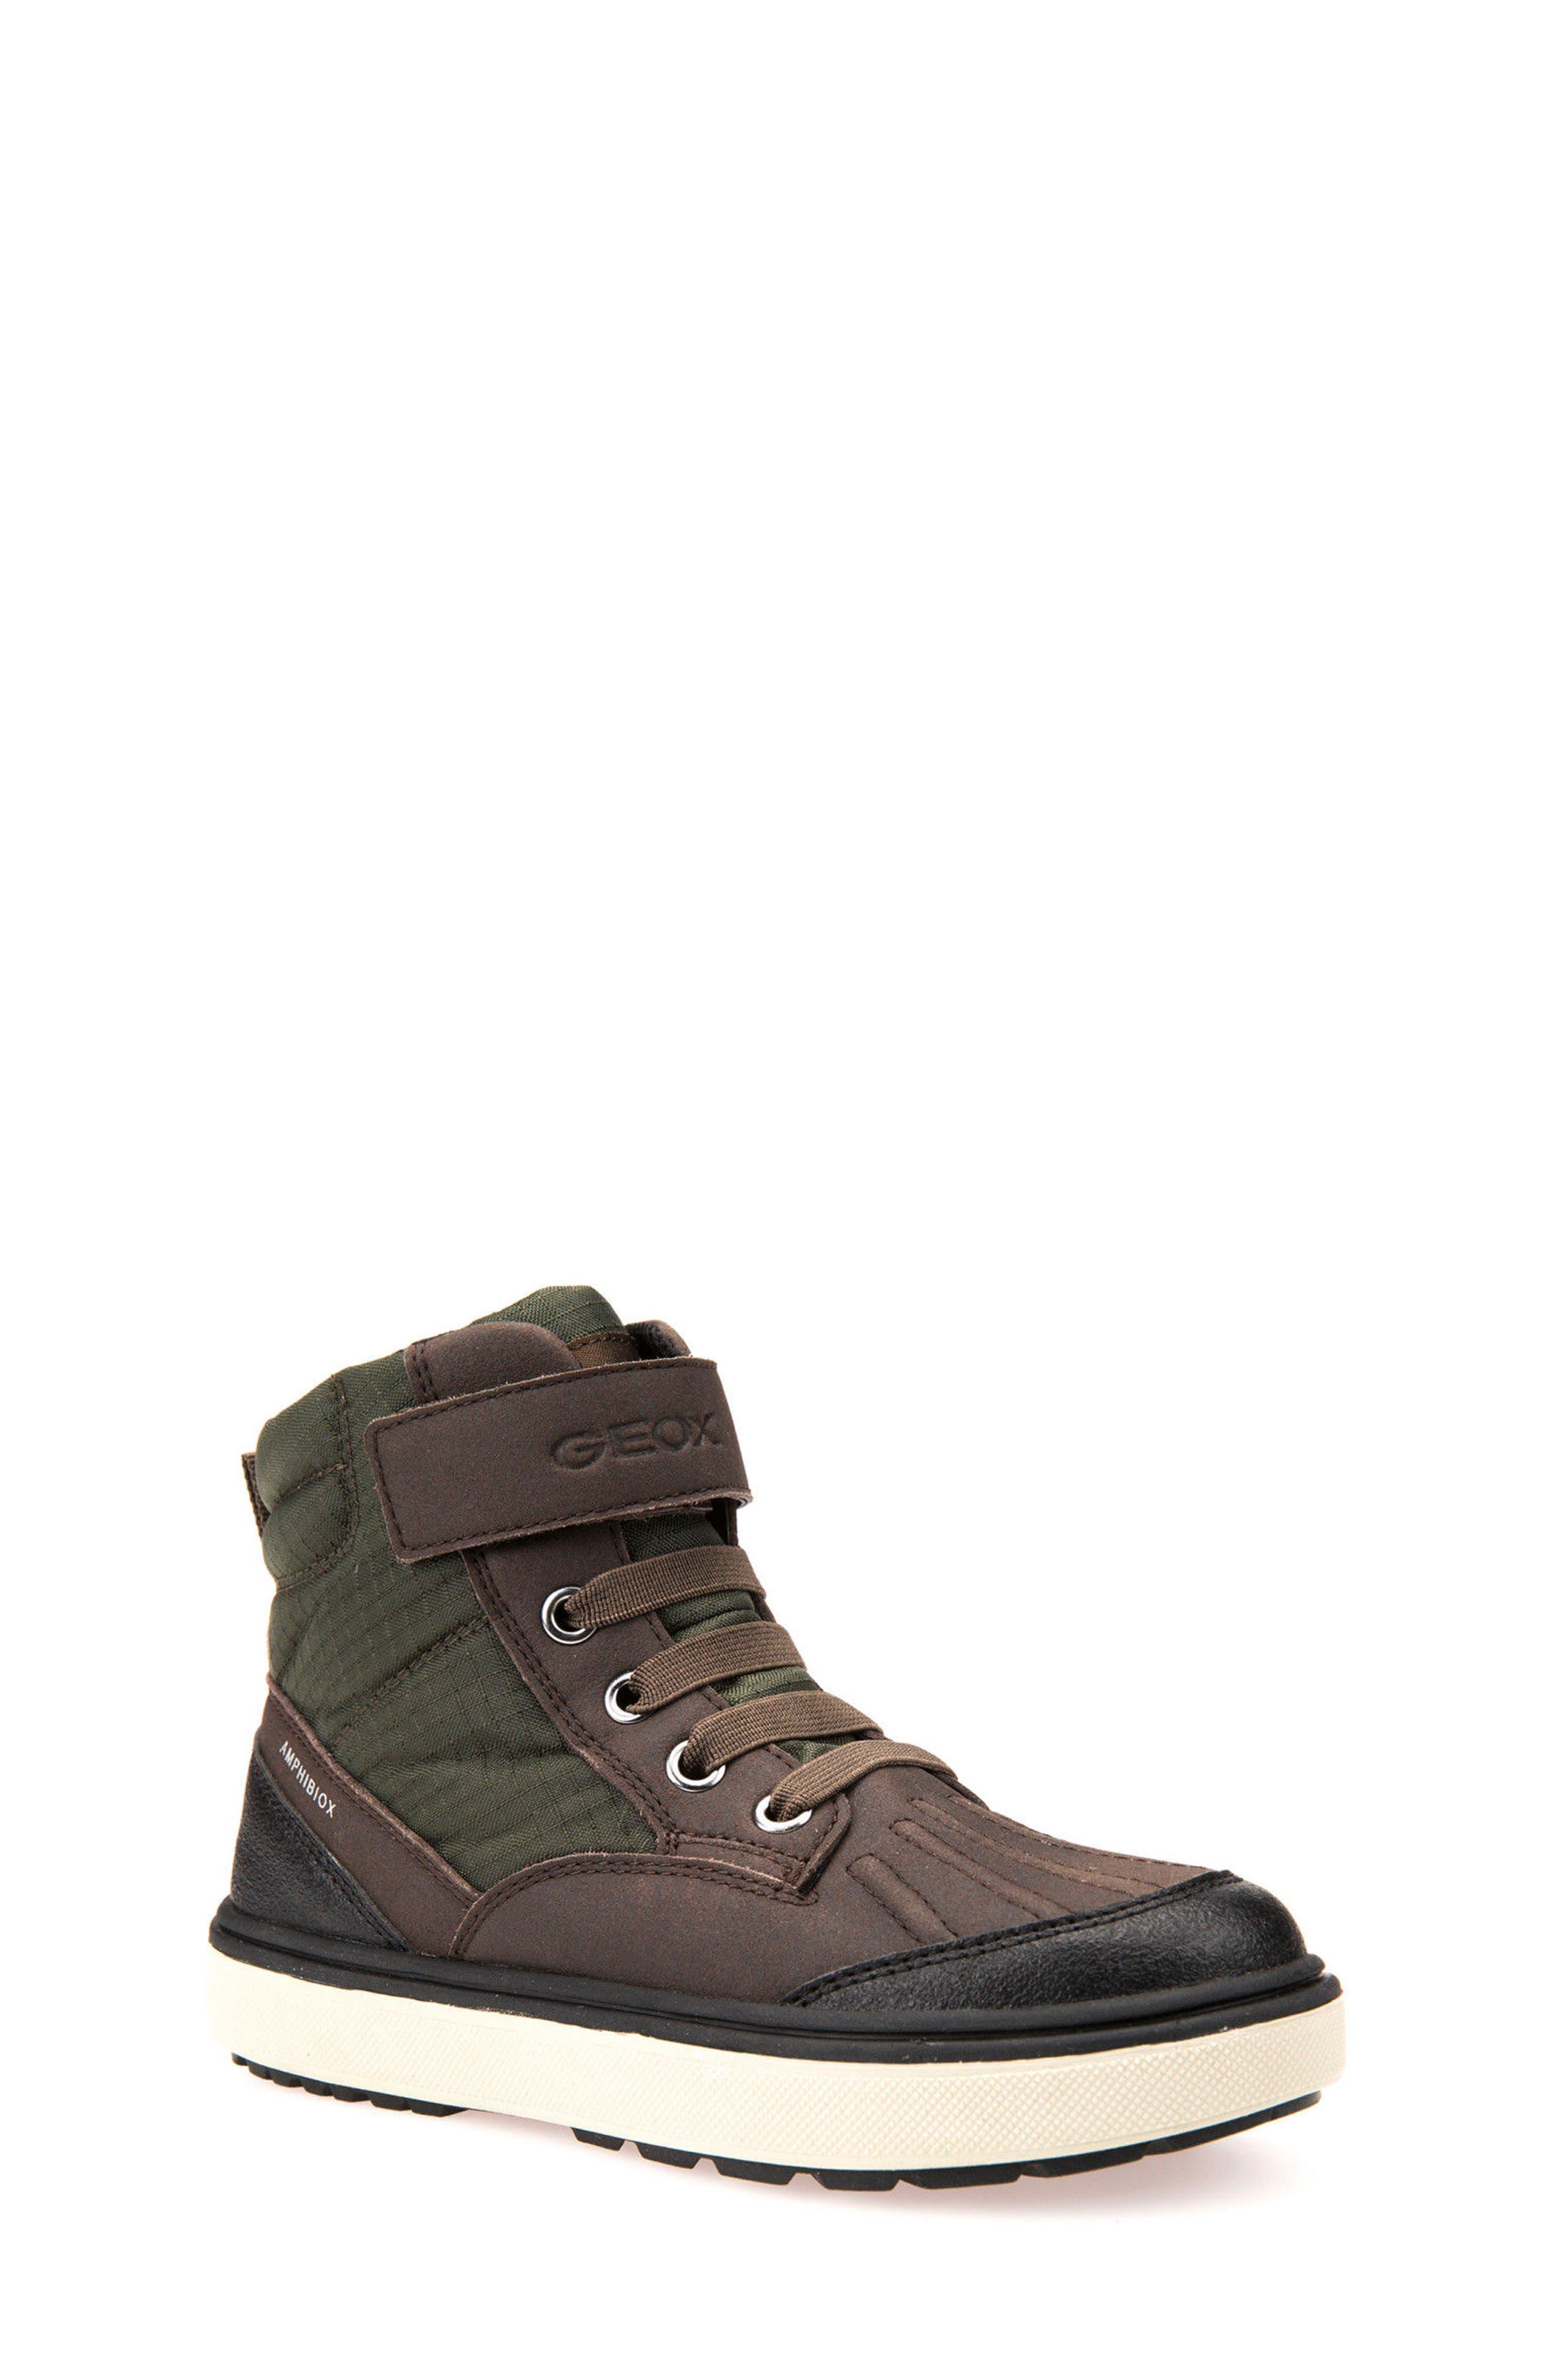 GEOX Mattias - ABX Amphibiox<sup>®</sup> Waterproof Sneaker